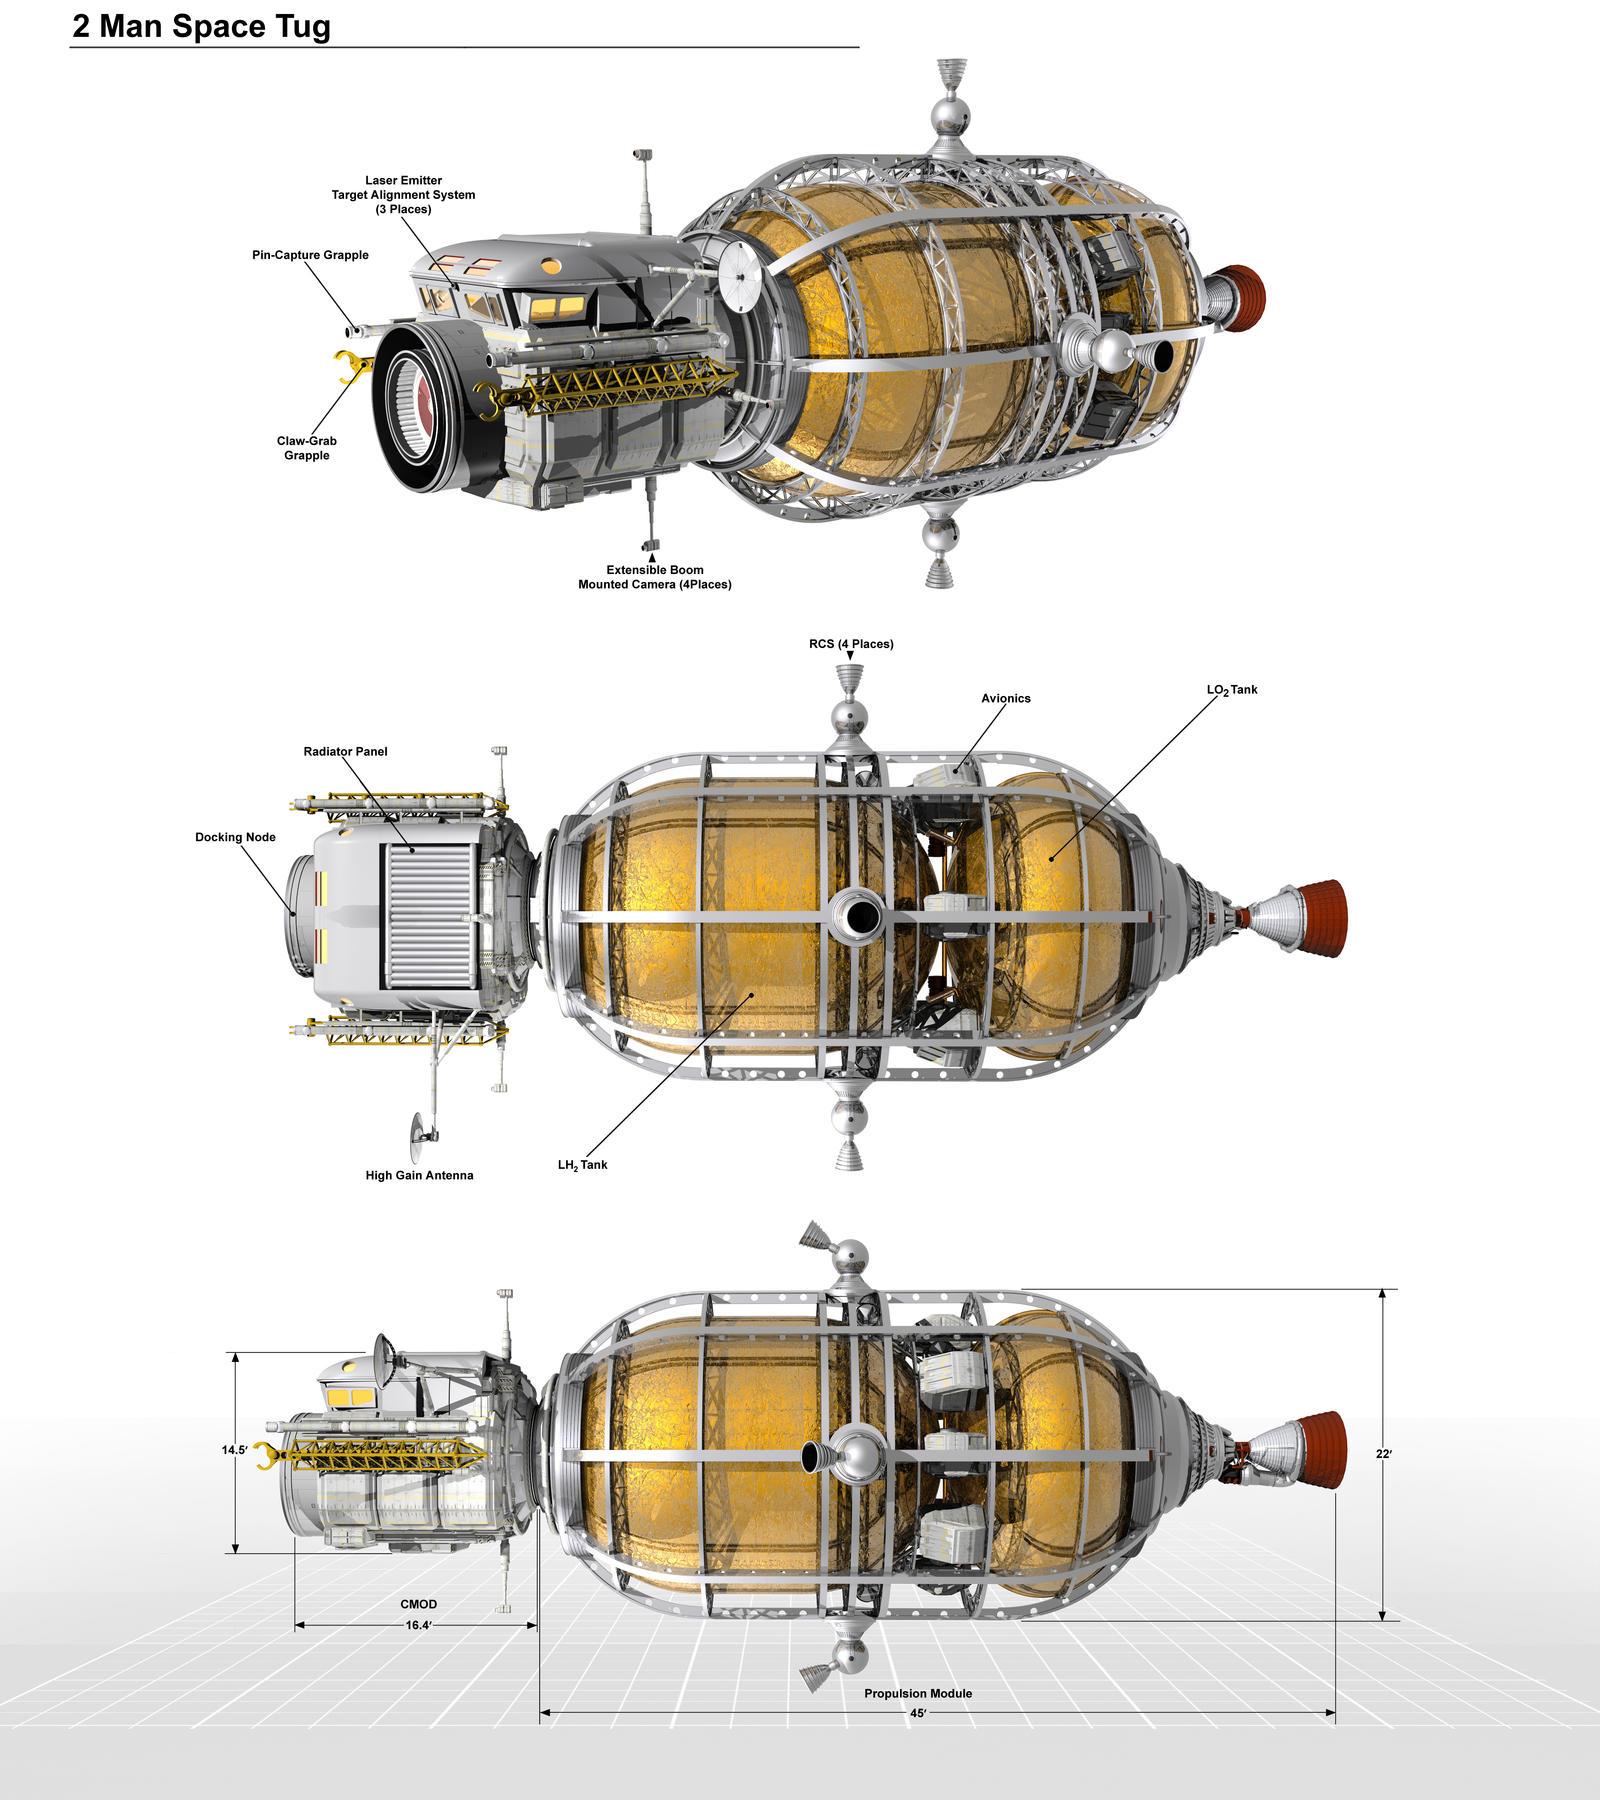 2 Man Space Tug Diagram